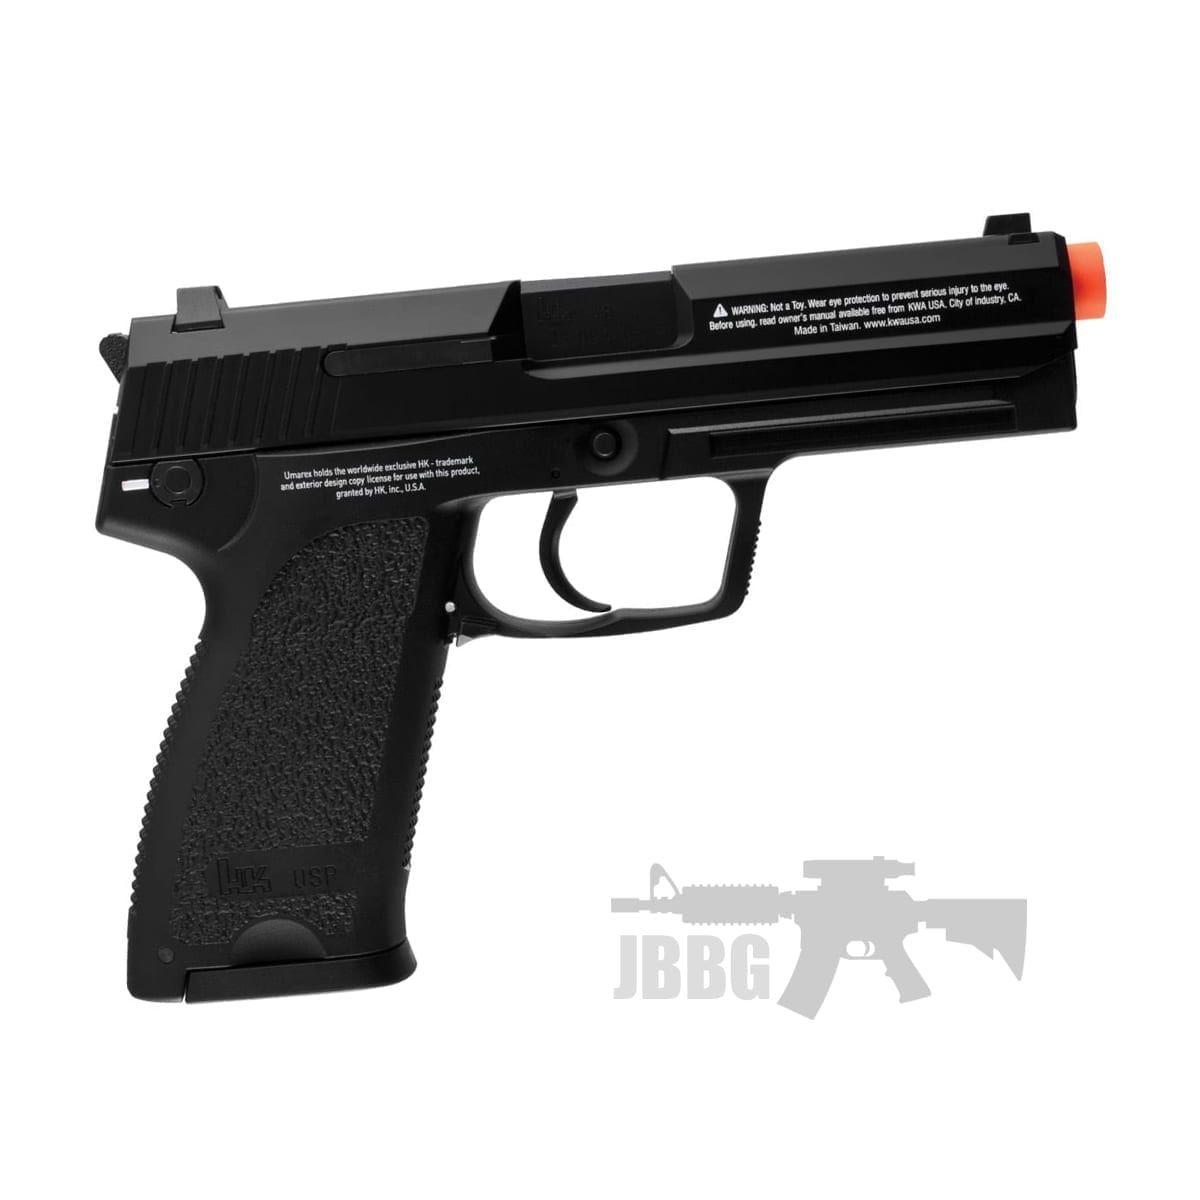 usp airsoft pistol